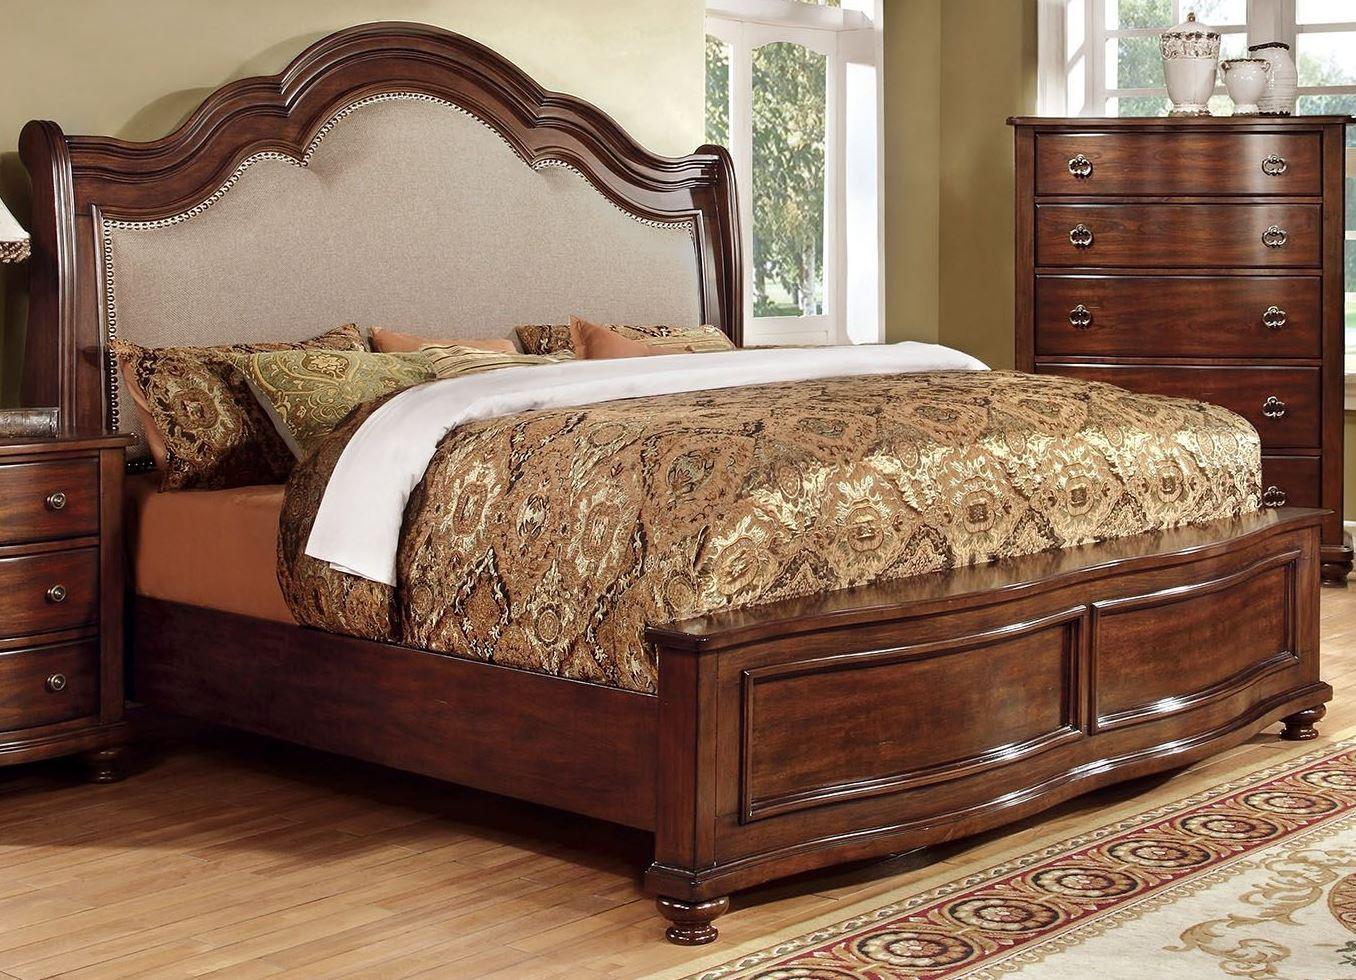 Bellavista Brown Cherry King Bed From Furniture Of America Cm7350ek Bed Coleman Furniture